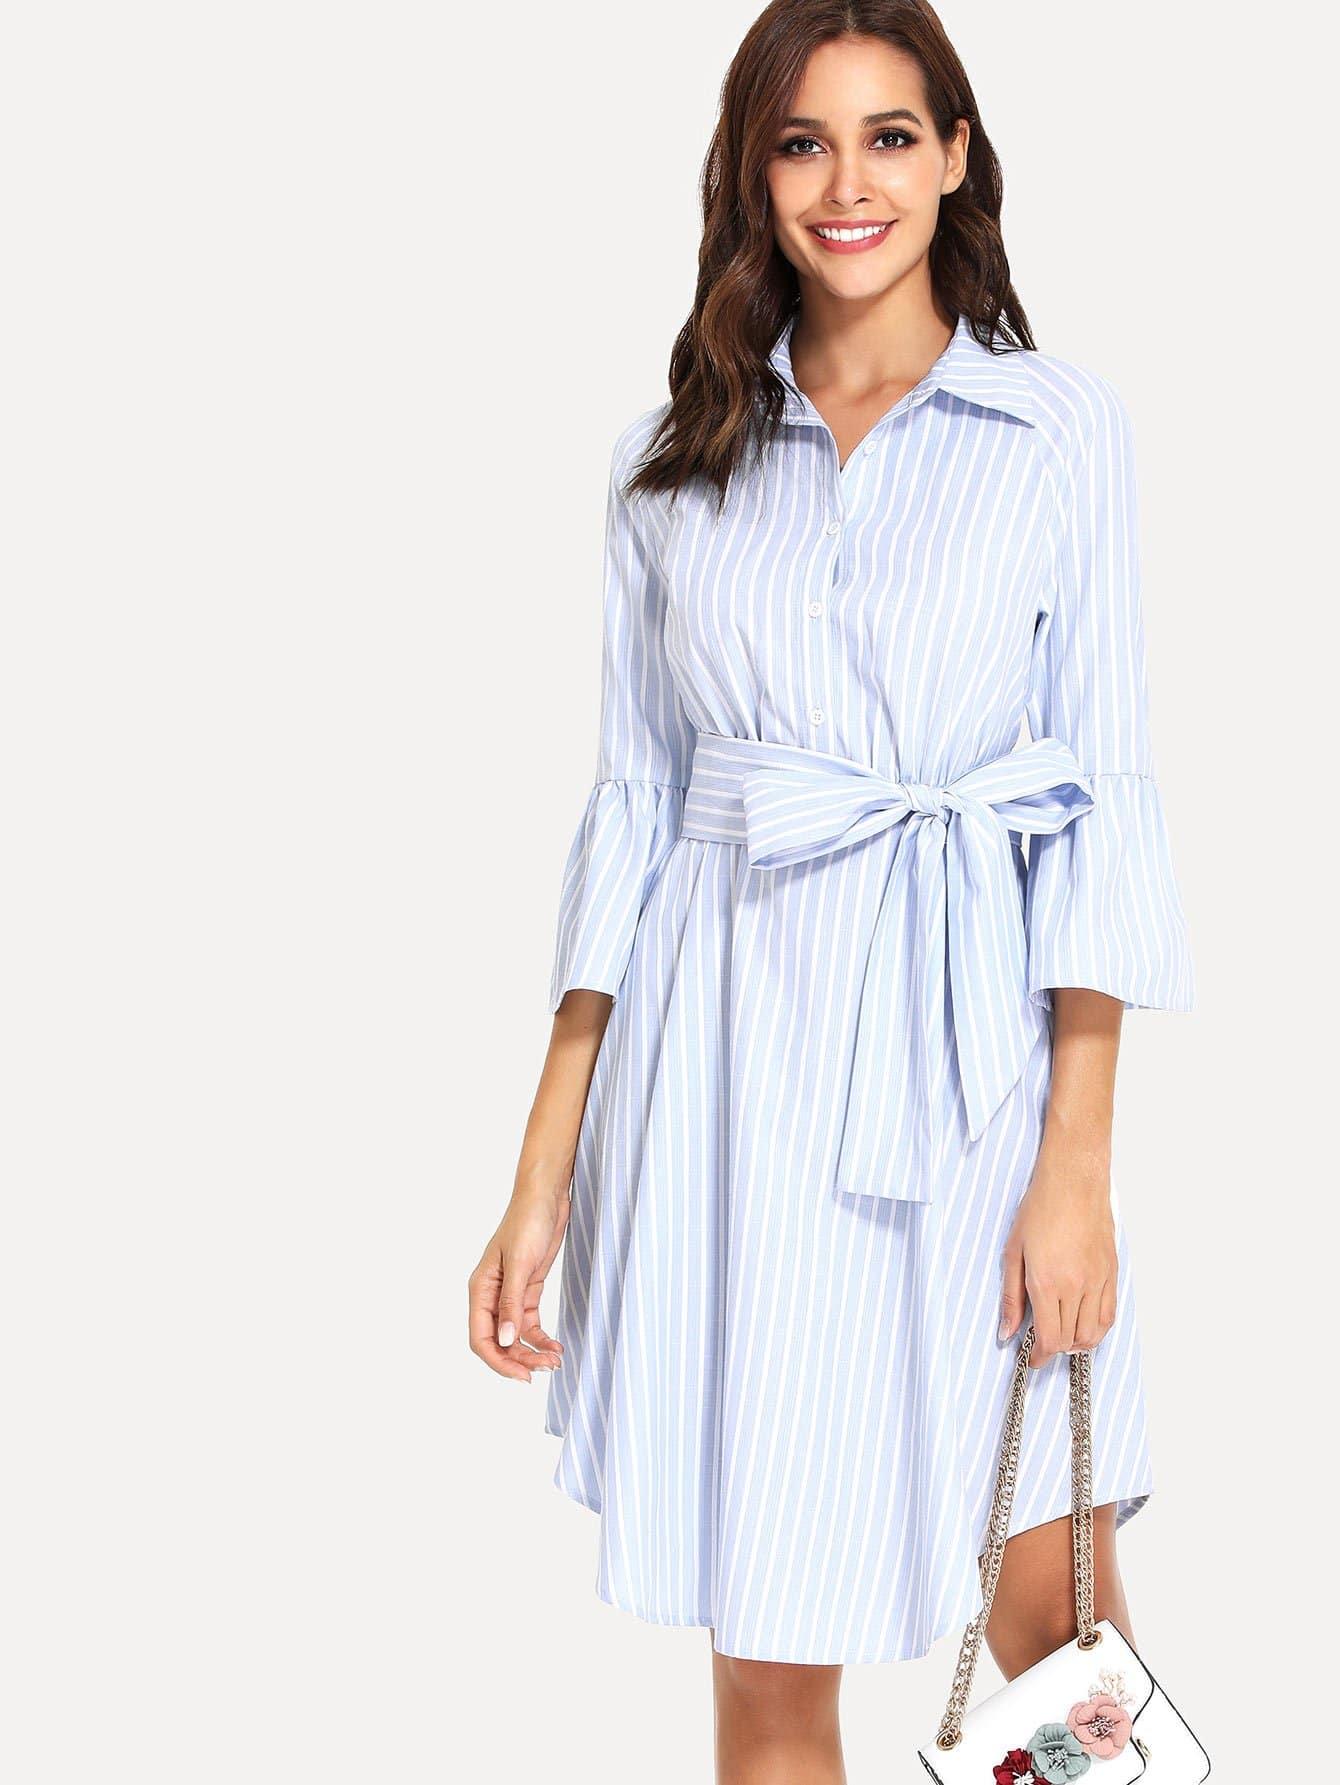 Ruffle Sleeve Pinstripe Curved Hem Shirt Dress batwing sleeve pocket side curved hem textured dress